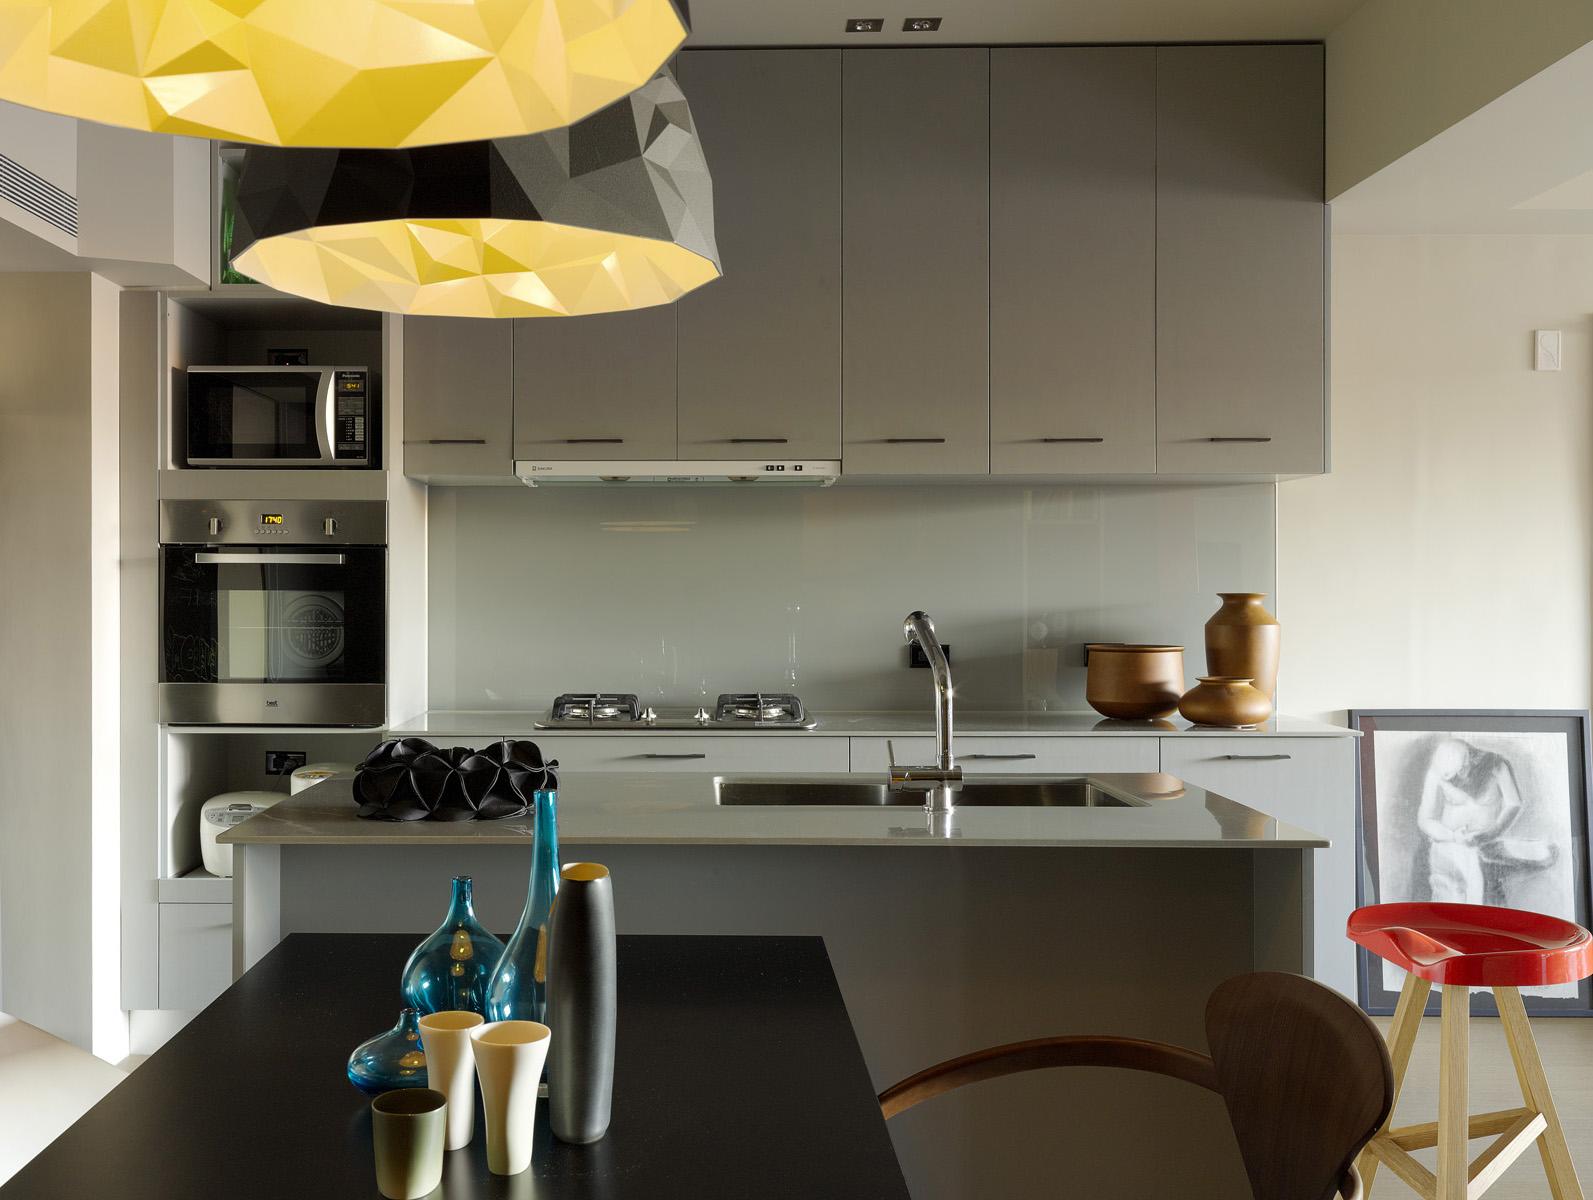 3 Minimalist Kitchen Interior Design Ideas